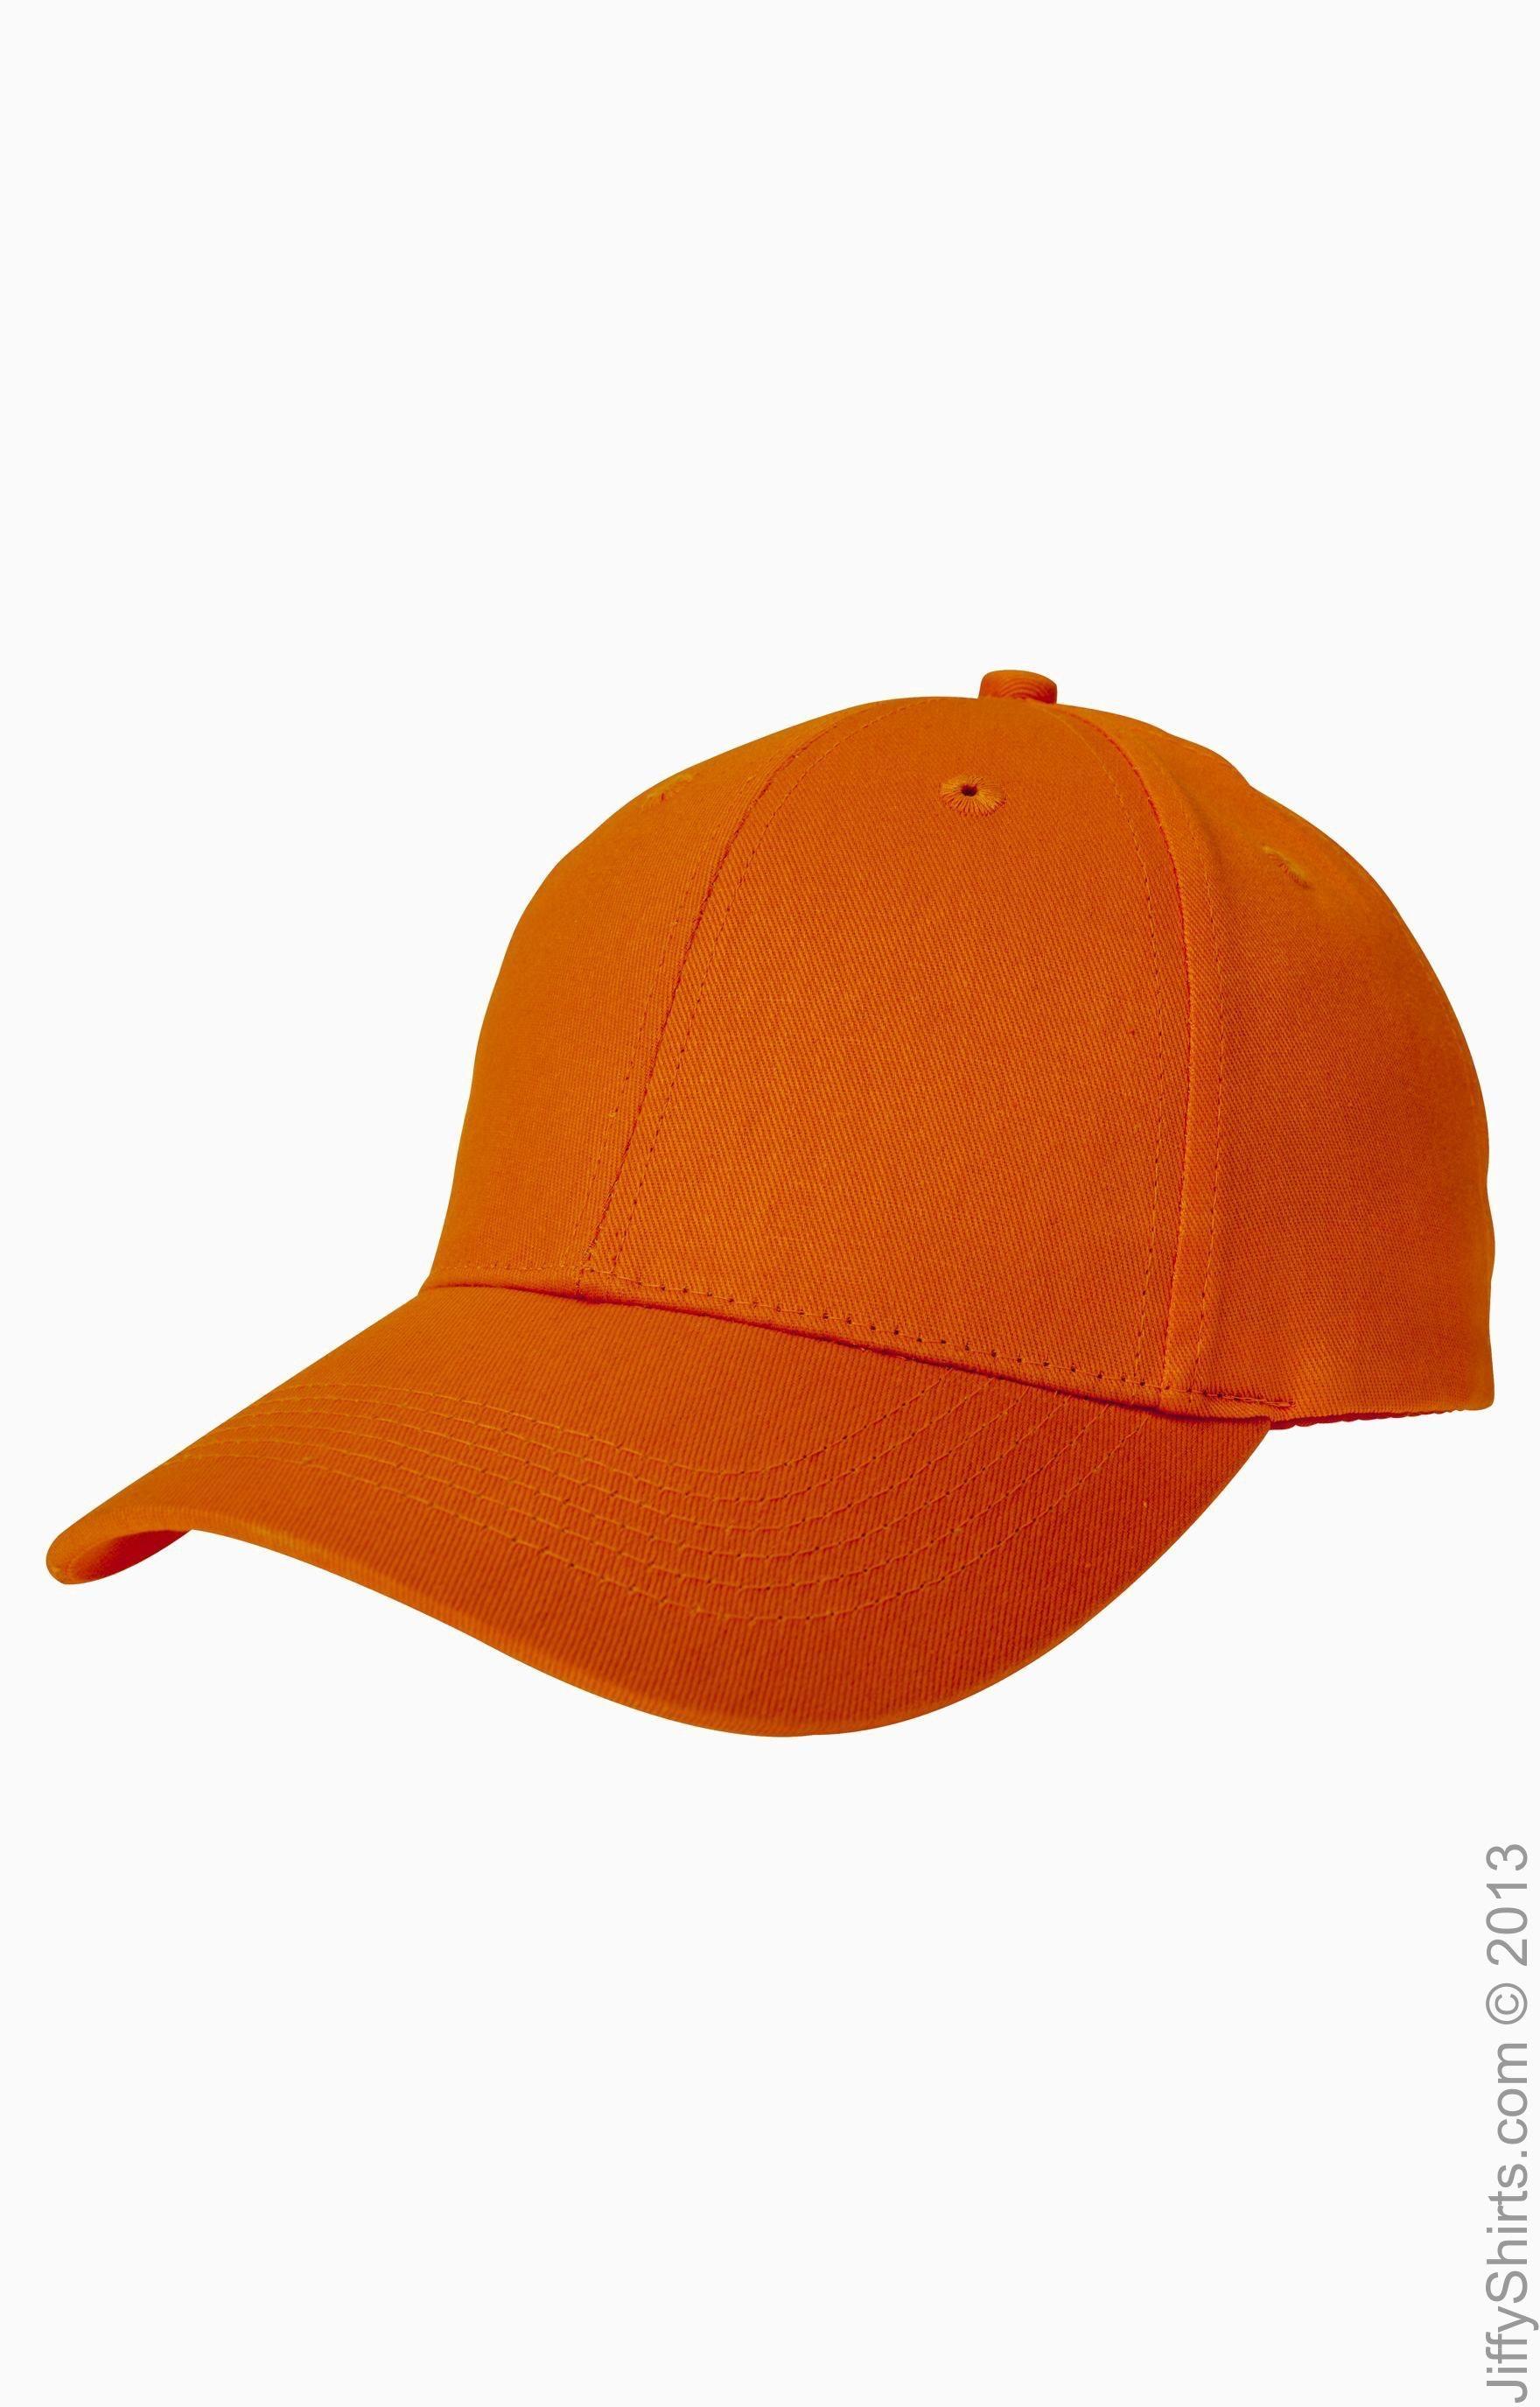 BX020 - Orange